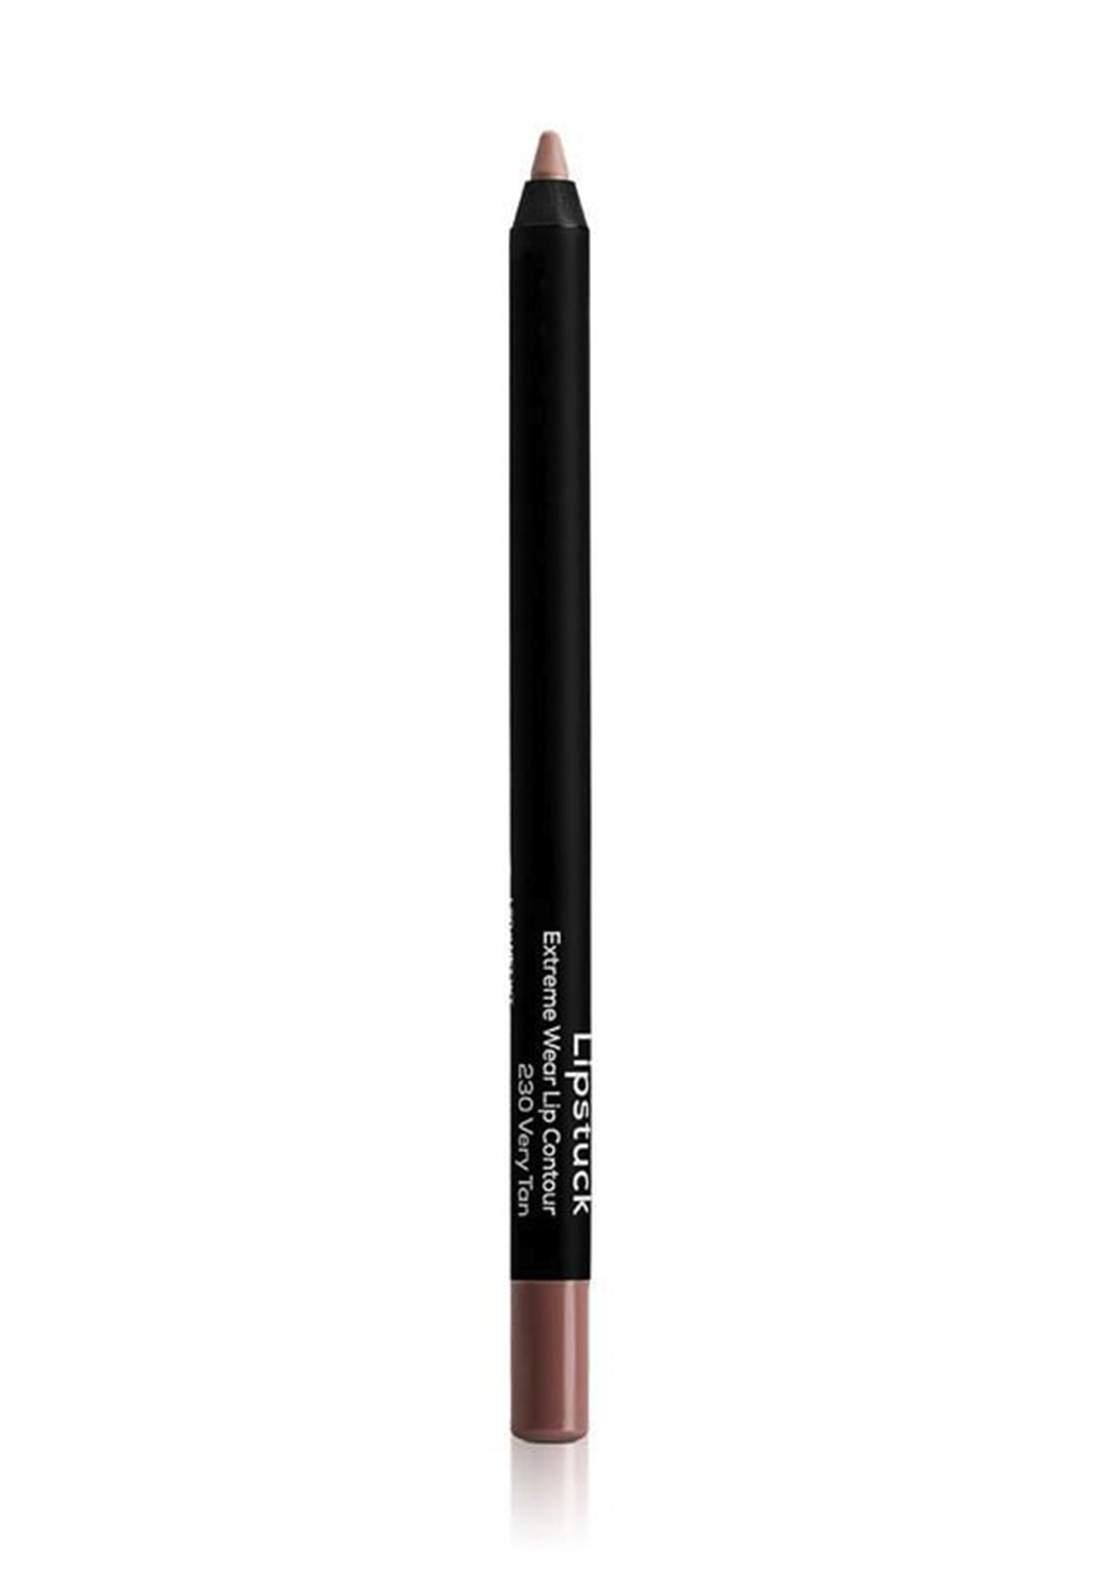 Wow By Wojooh W680 Lipstuck Extreme Wear Lip Contour No.230 Very Tan 1.20g محدد الشفاه